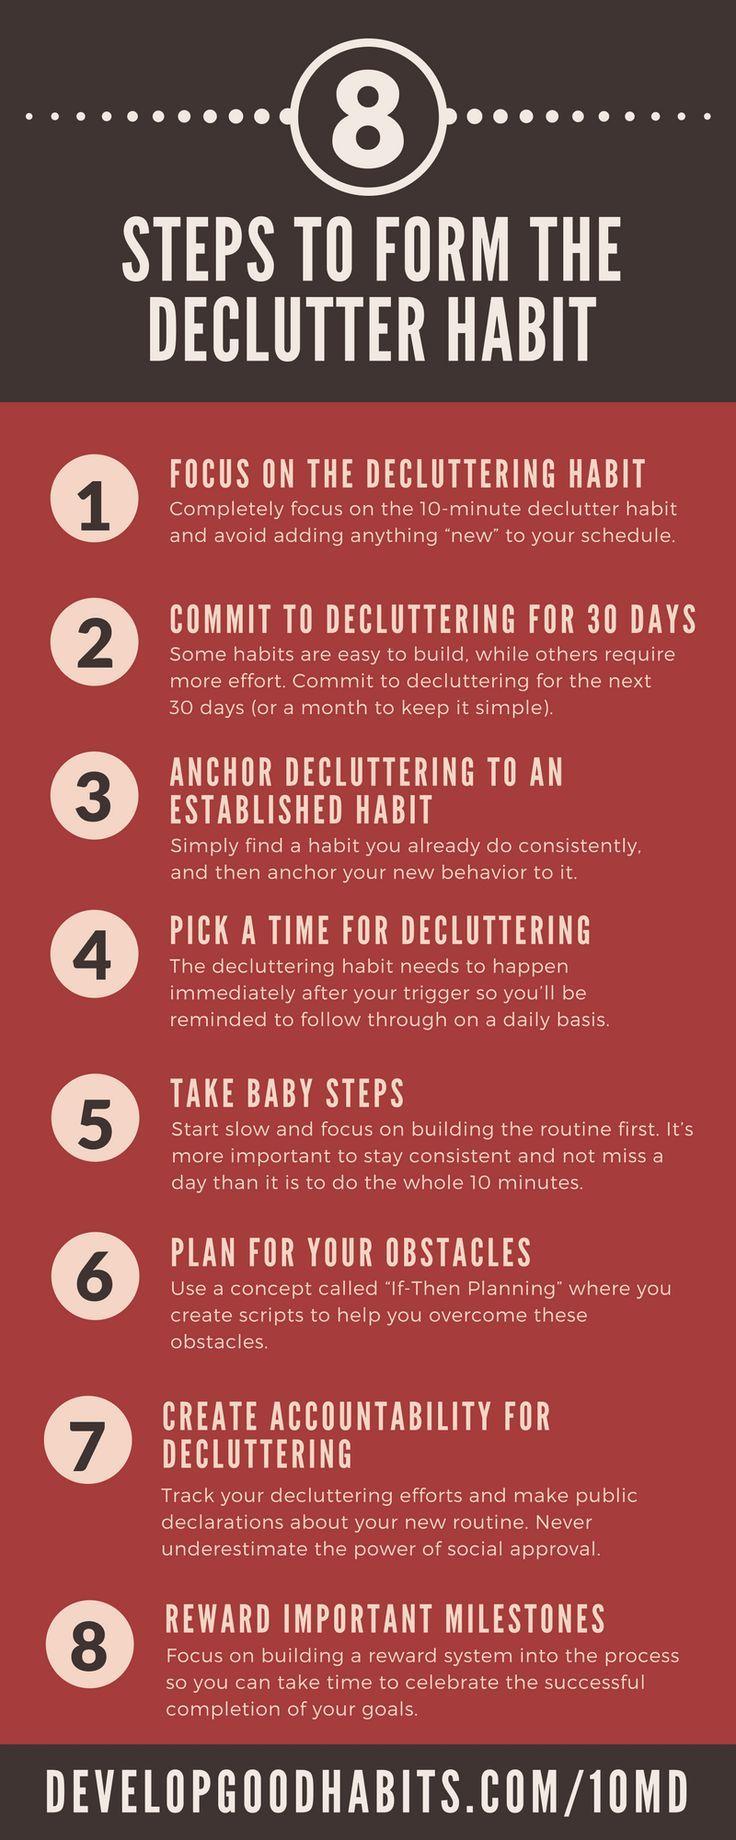 How to Form a Decluttering Habit. ------ Excerpt from 10 Minute Declutter- Steve Scott and Barrie Davenport. ---- http://www.developgoodhabits.com/10minutedeclutter Declutter. Organize. Commit.